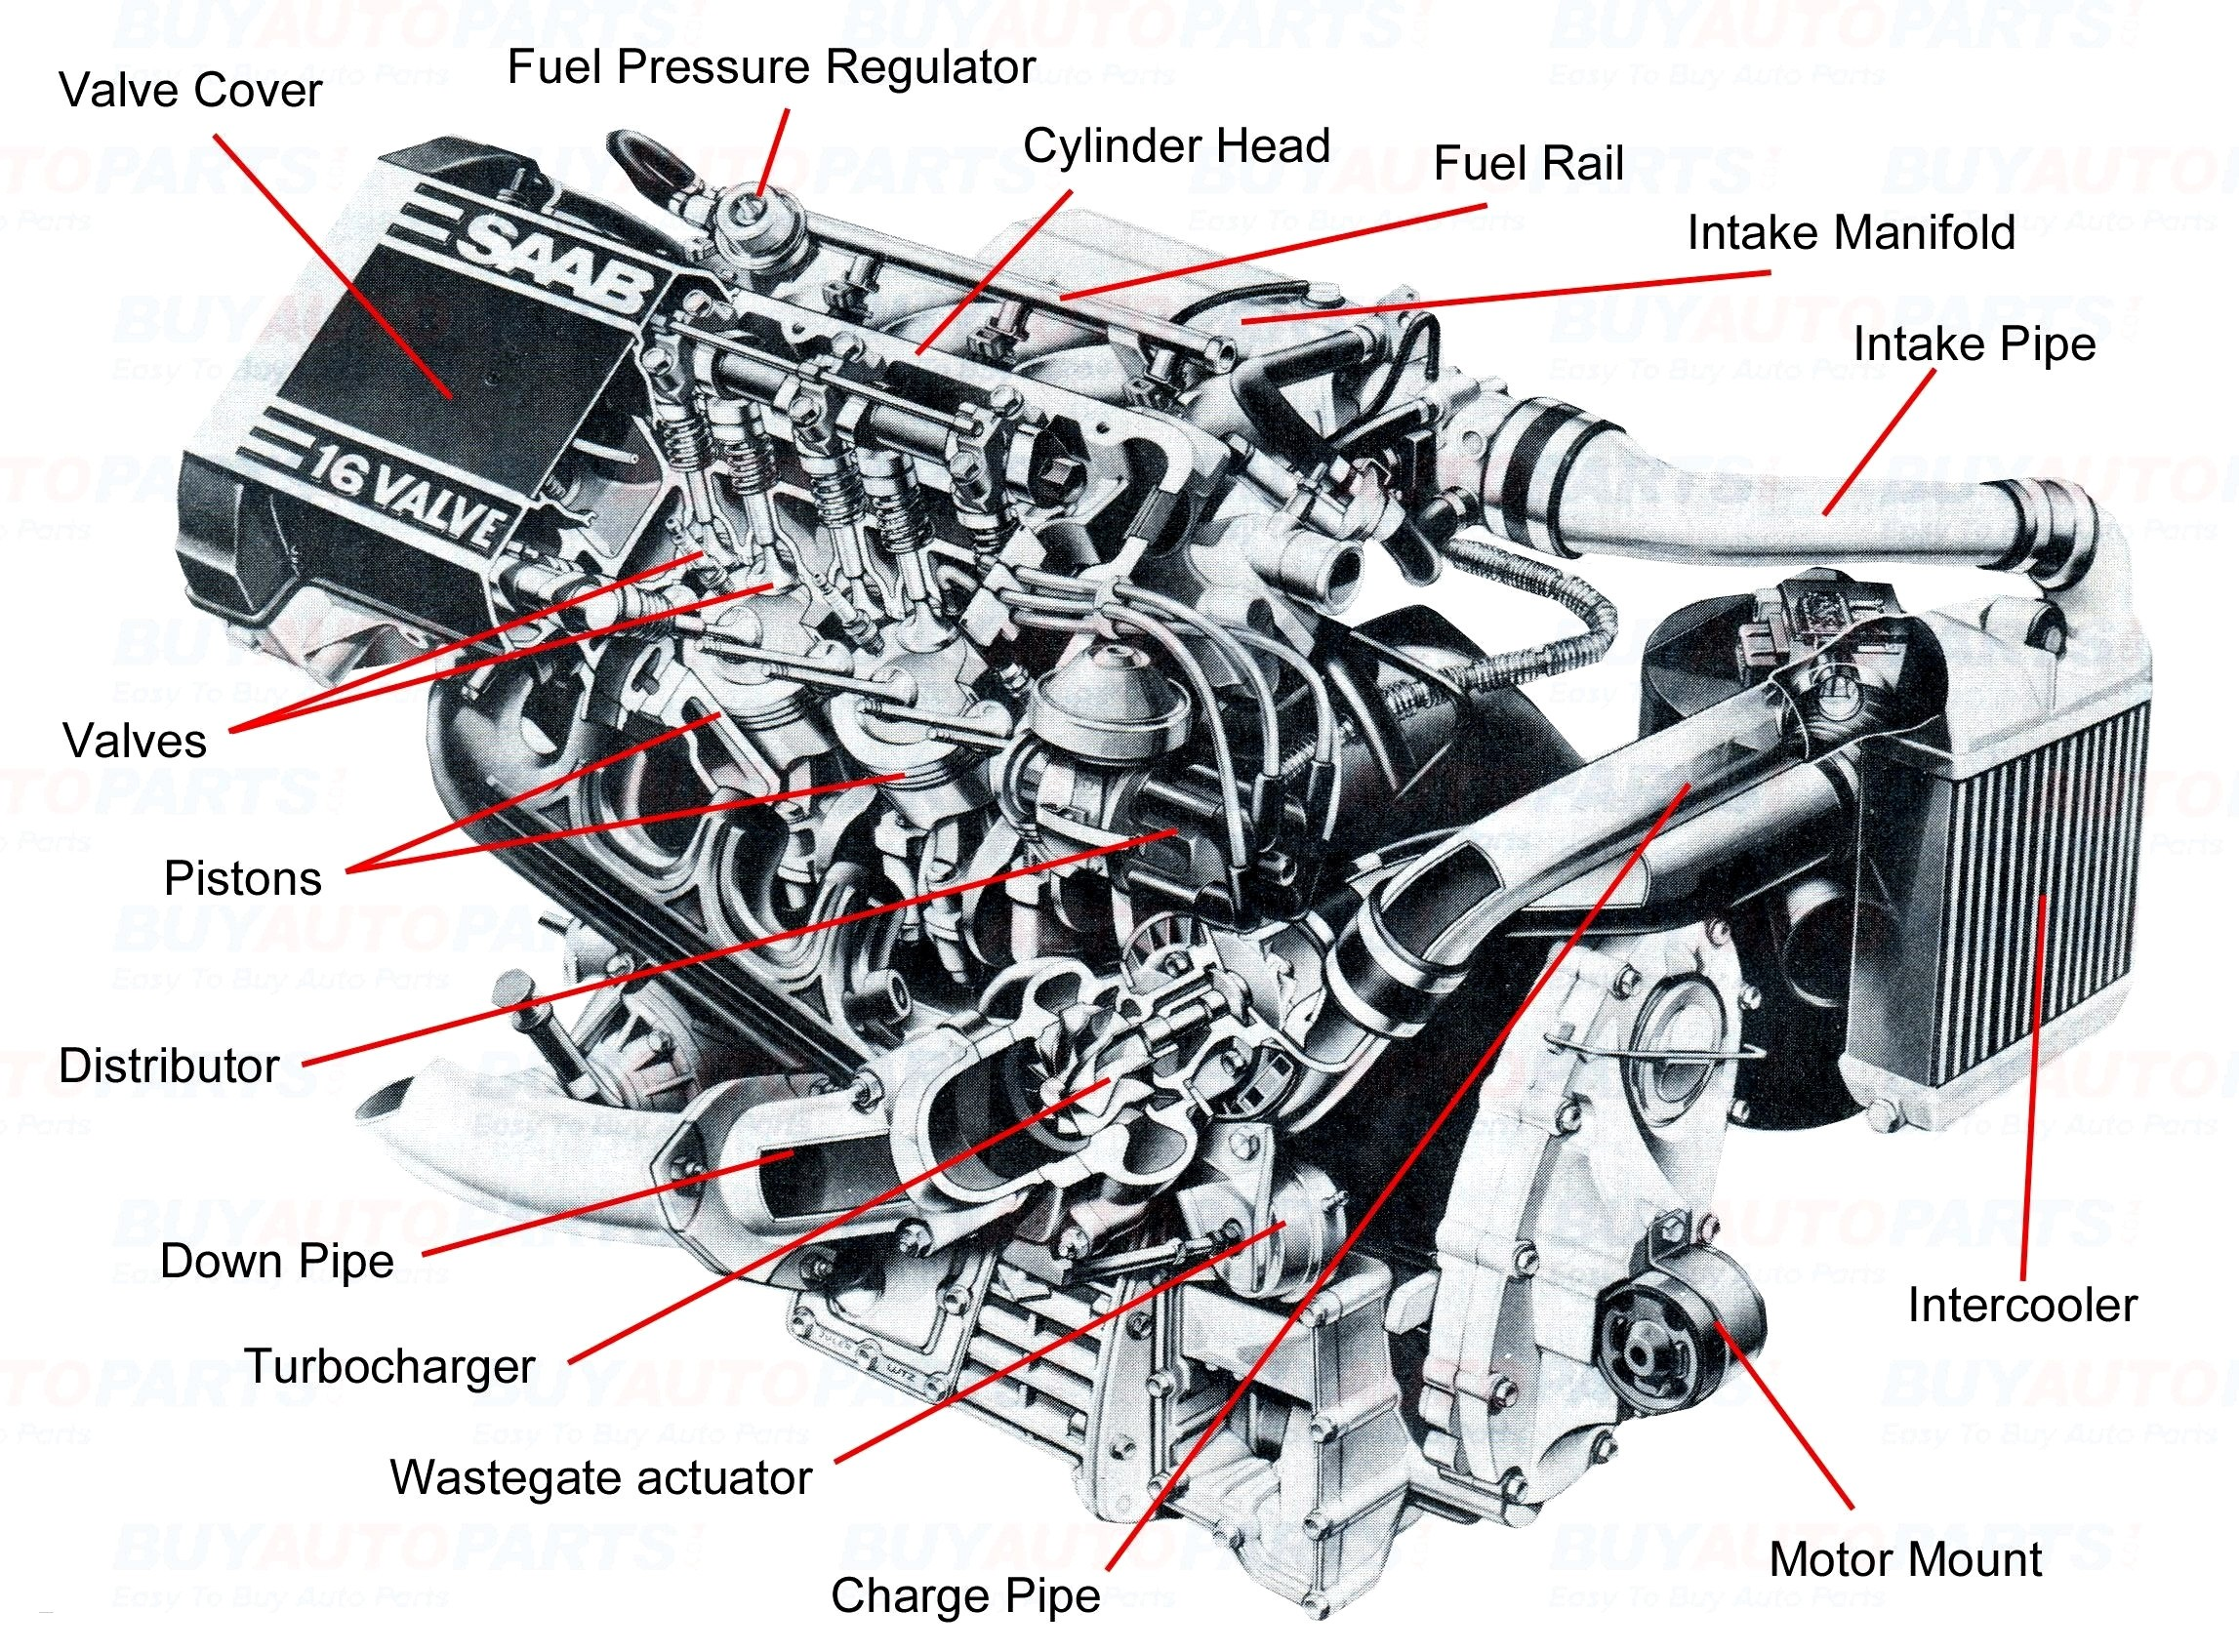 Diagram Of Car Fuel System Car Brake System Diagram Of Diagram Of Car Fuel System